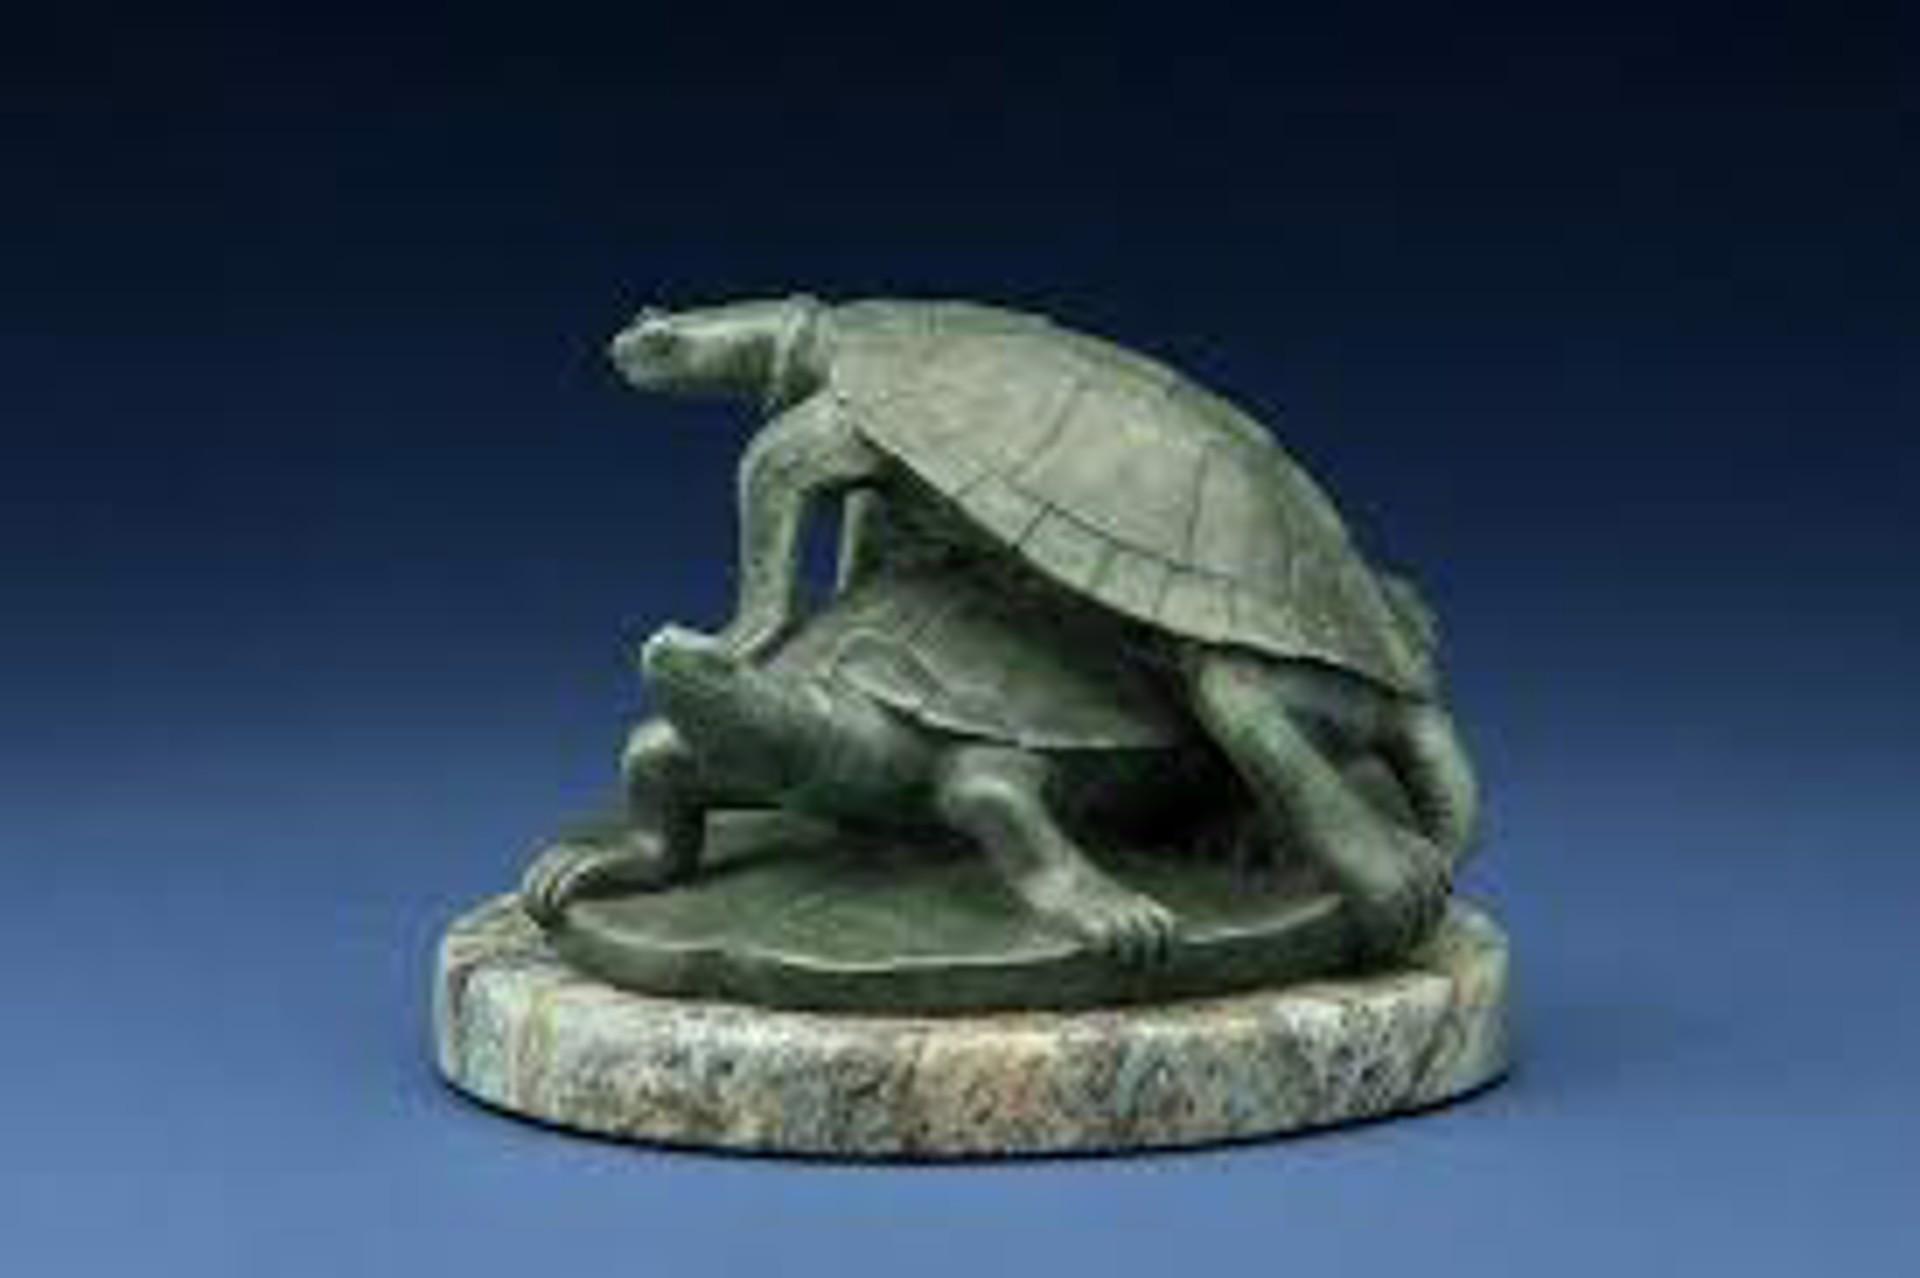 Turtle Pad by Tony Hochstetler